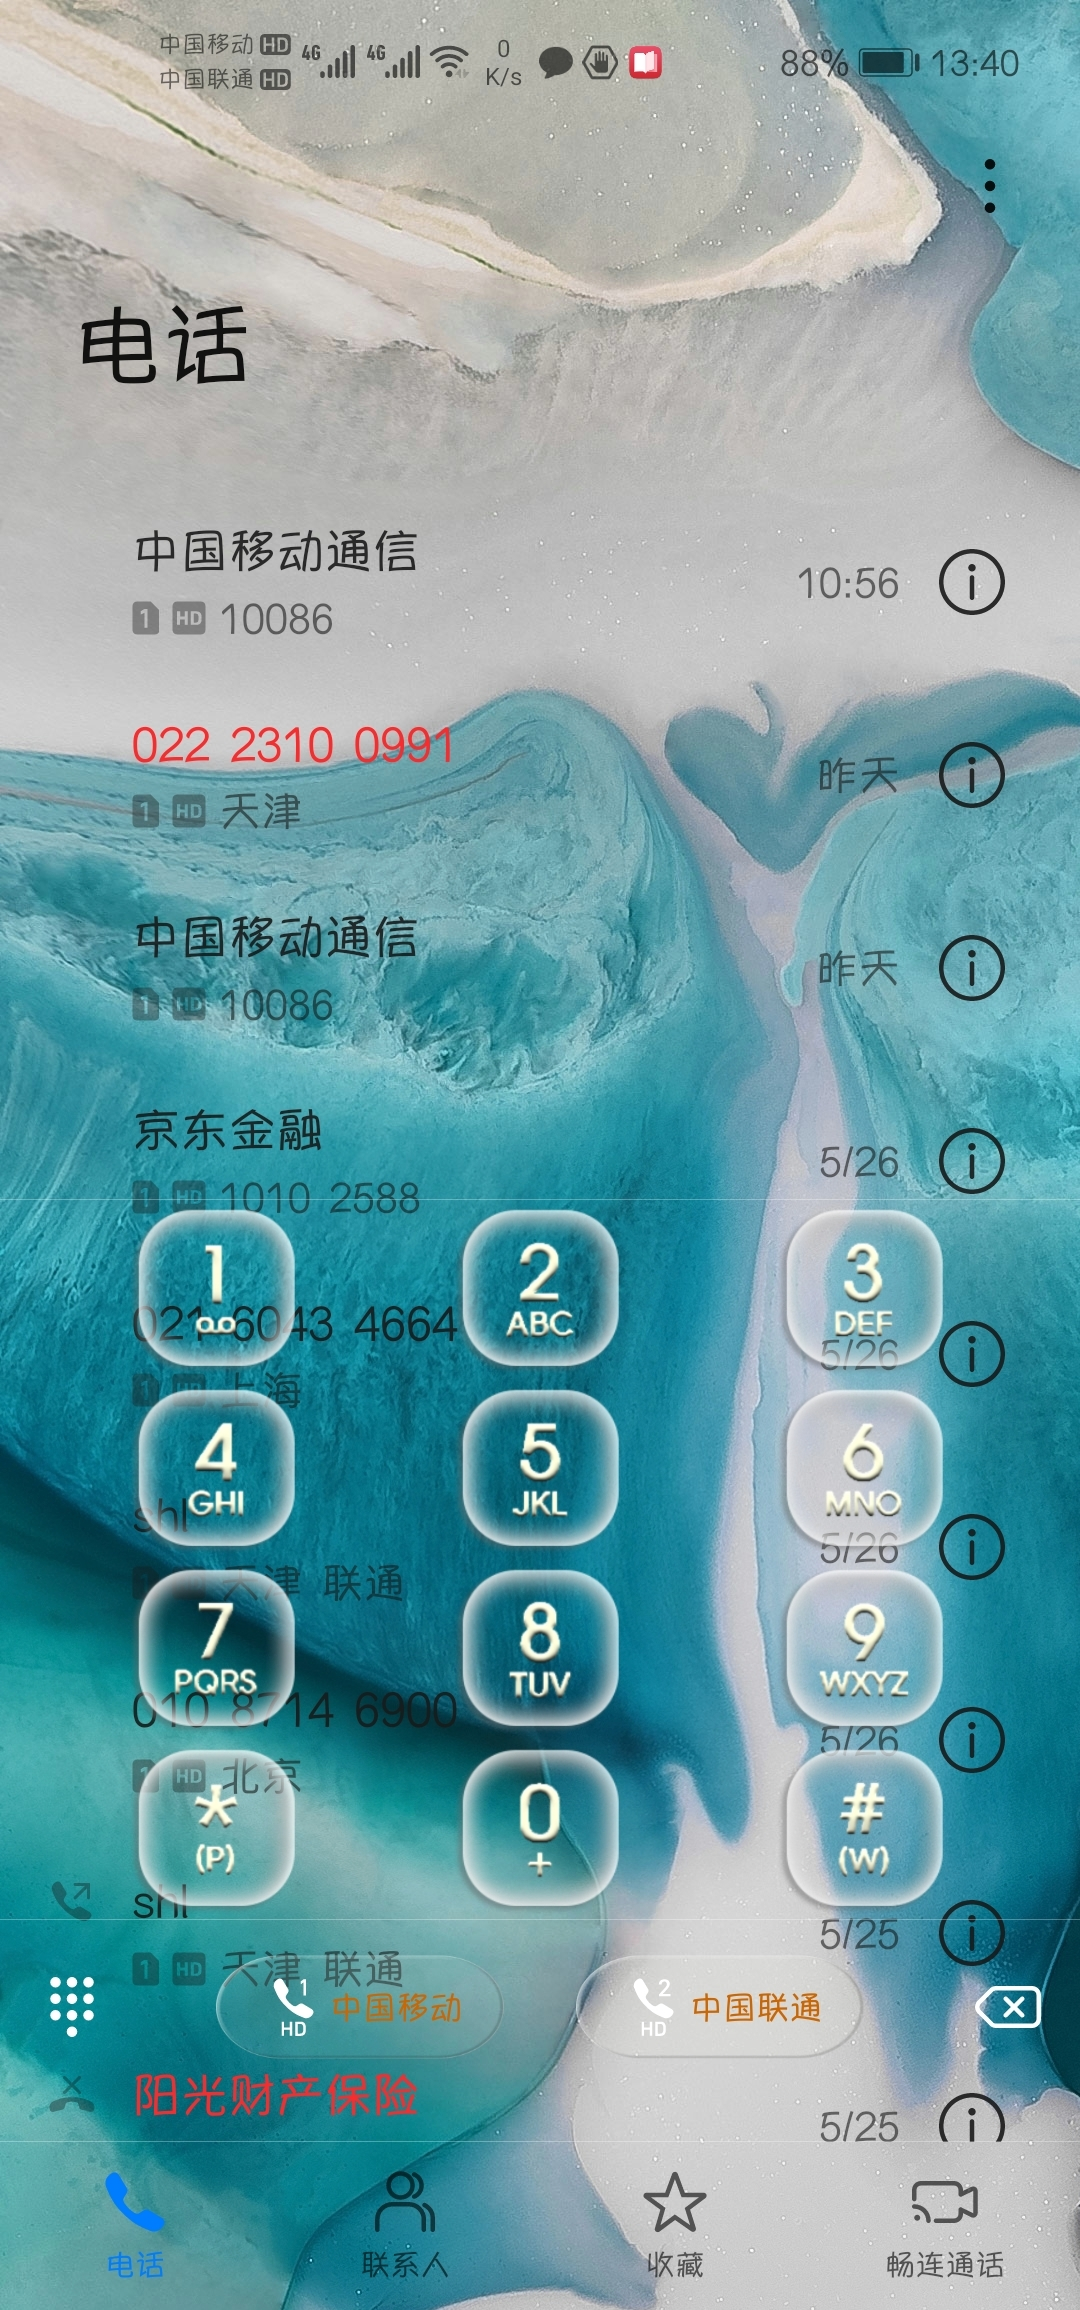 Screenshot_20200528_134020_com.android.contacts.jpg